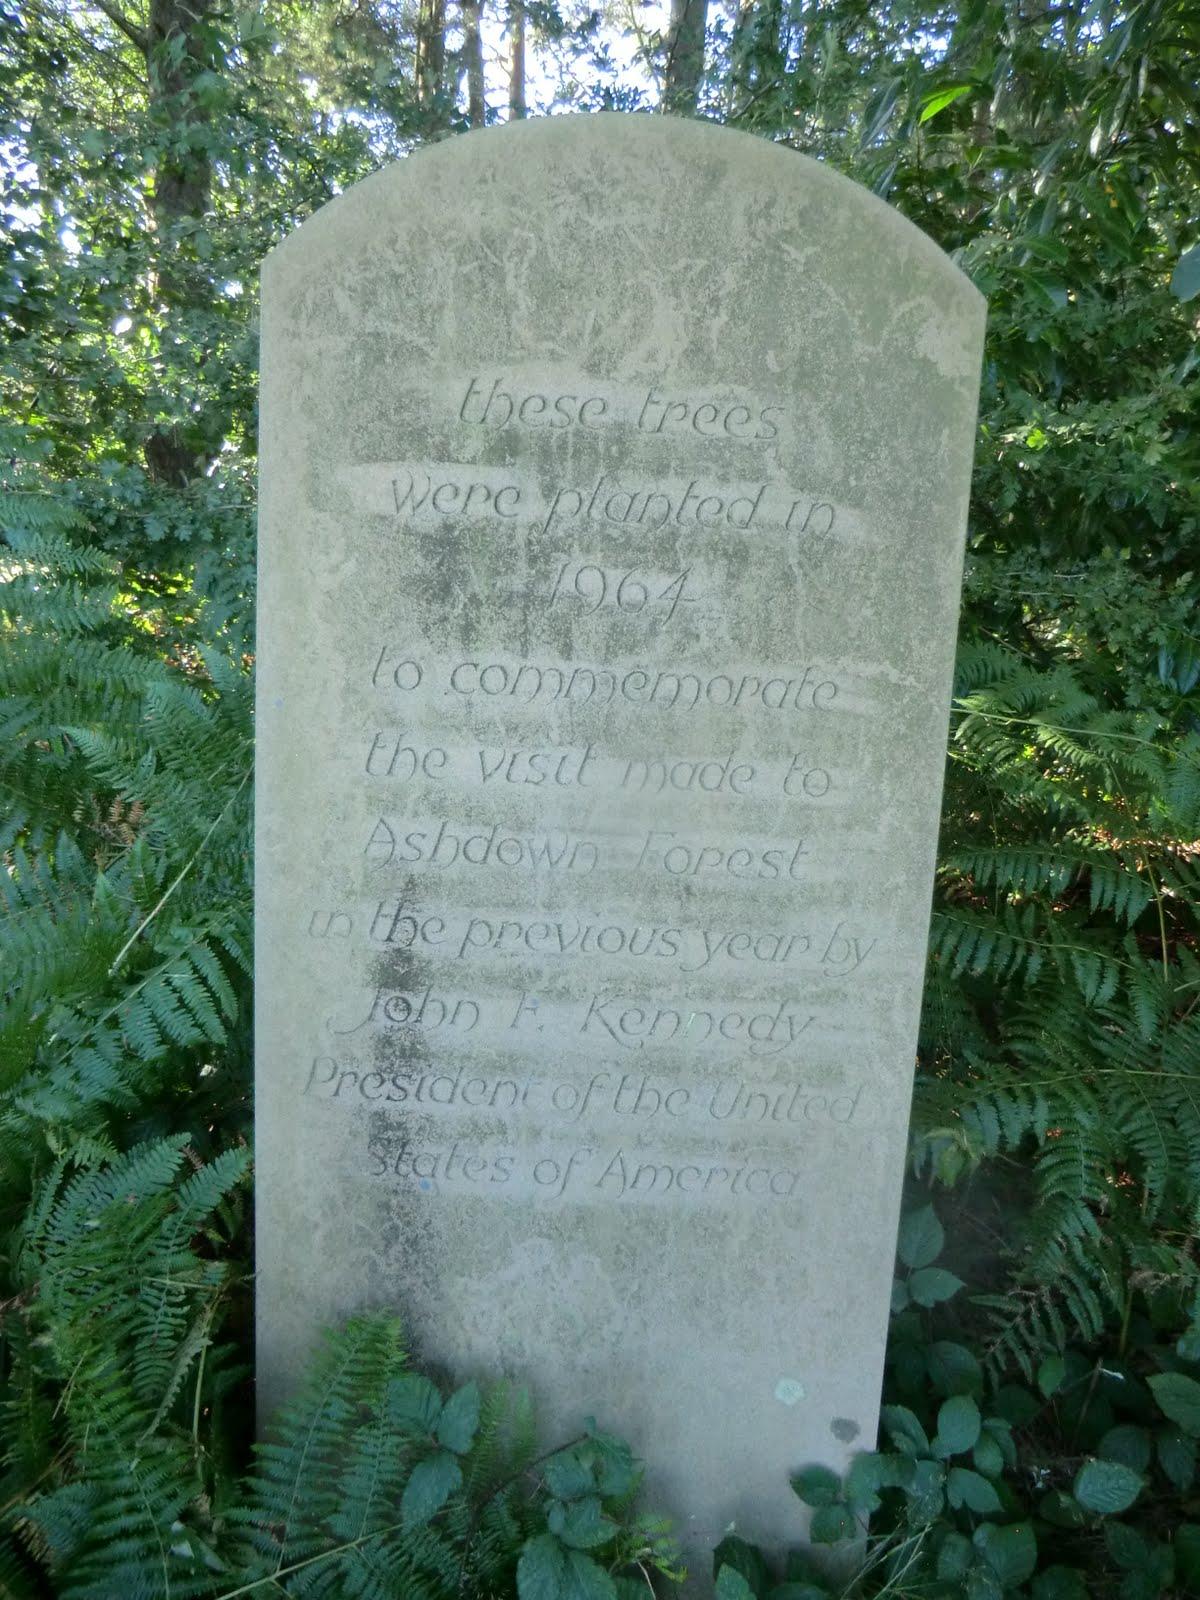 CIMG6478 Memorial at Kennedy Clump